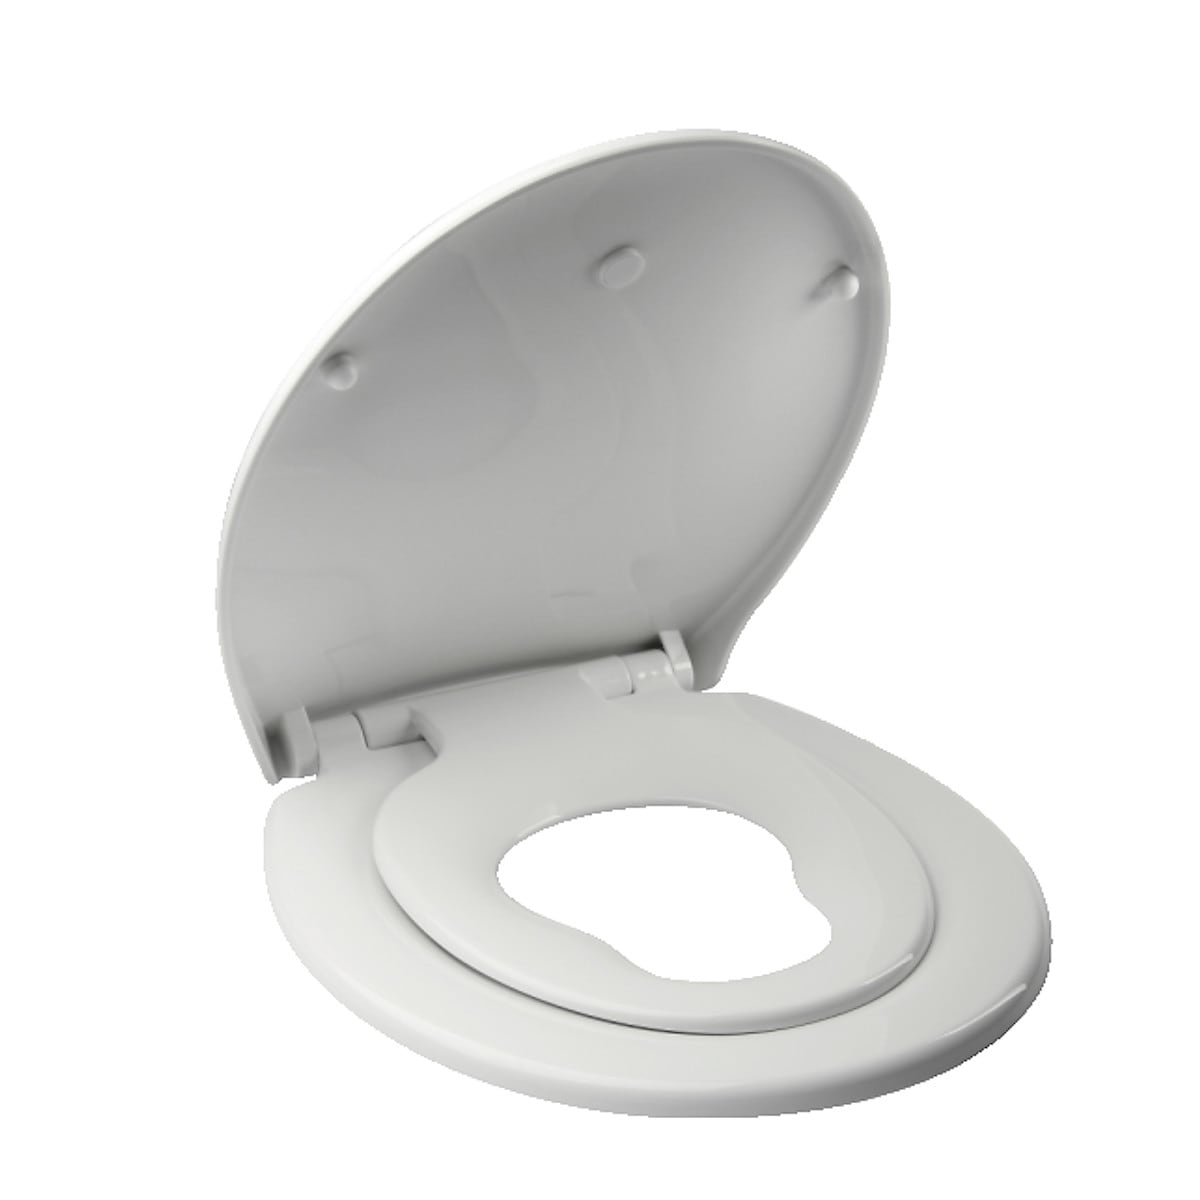 Toalettsits familj soft close